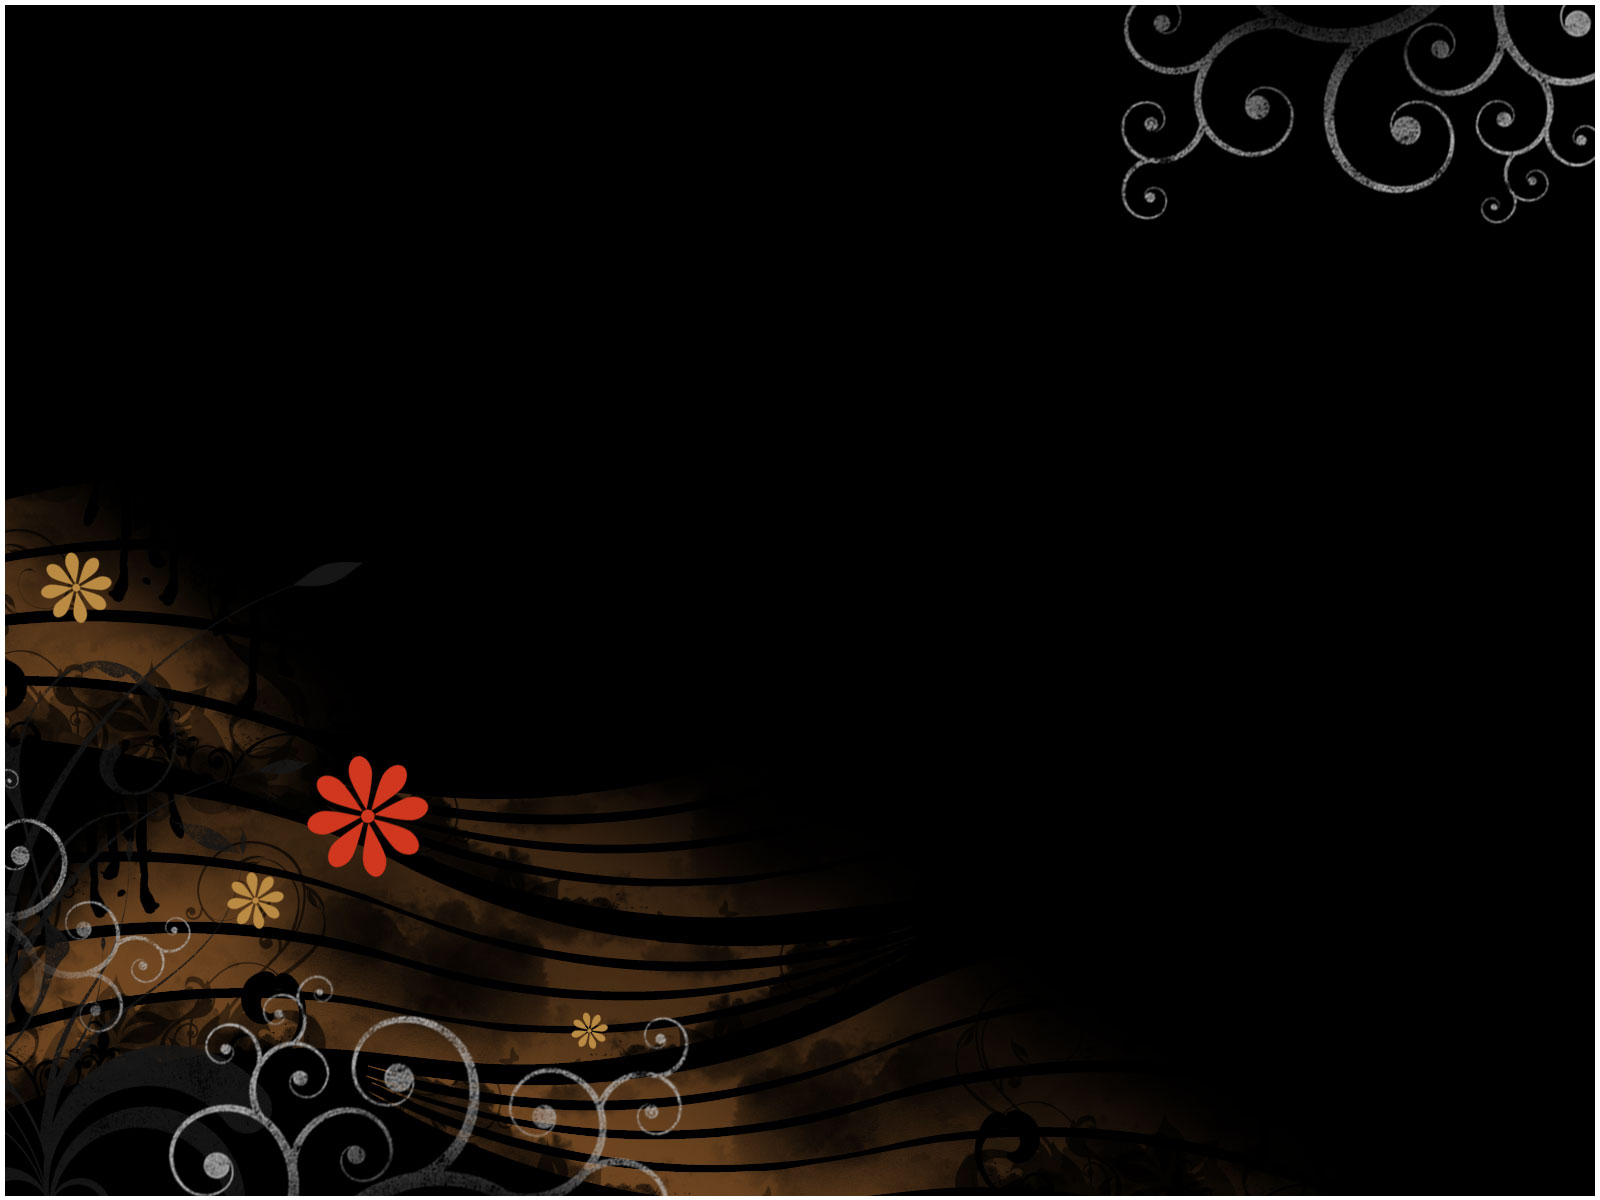 3d Animated Desktop Animated Desktop Wallpaper for Mac 3d 1600x1200